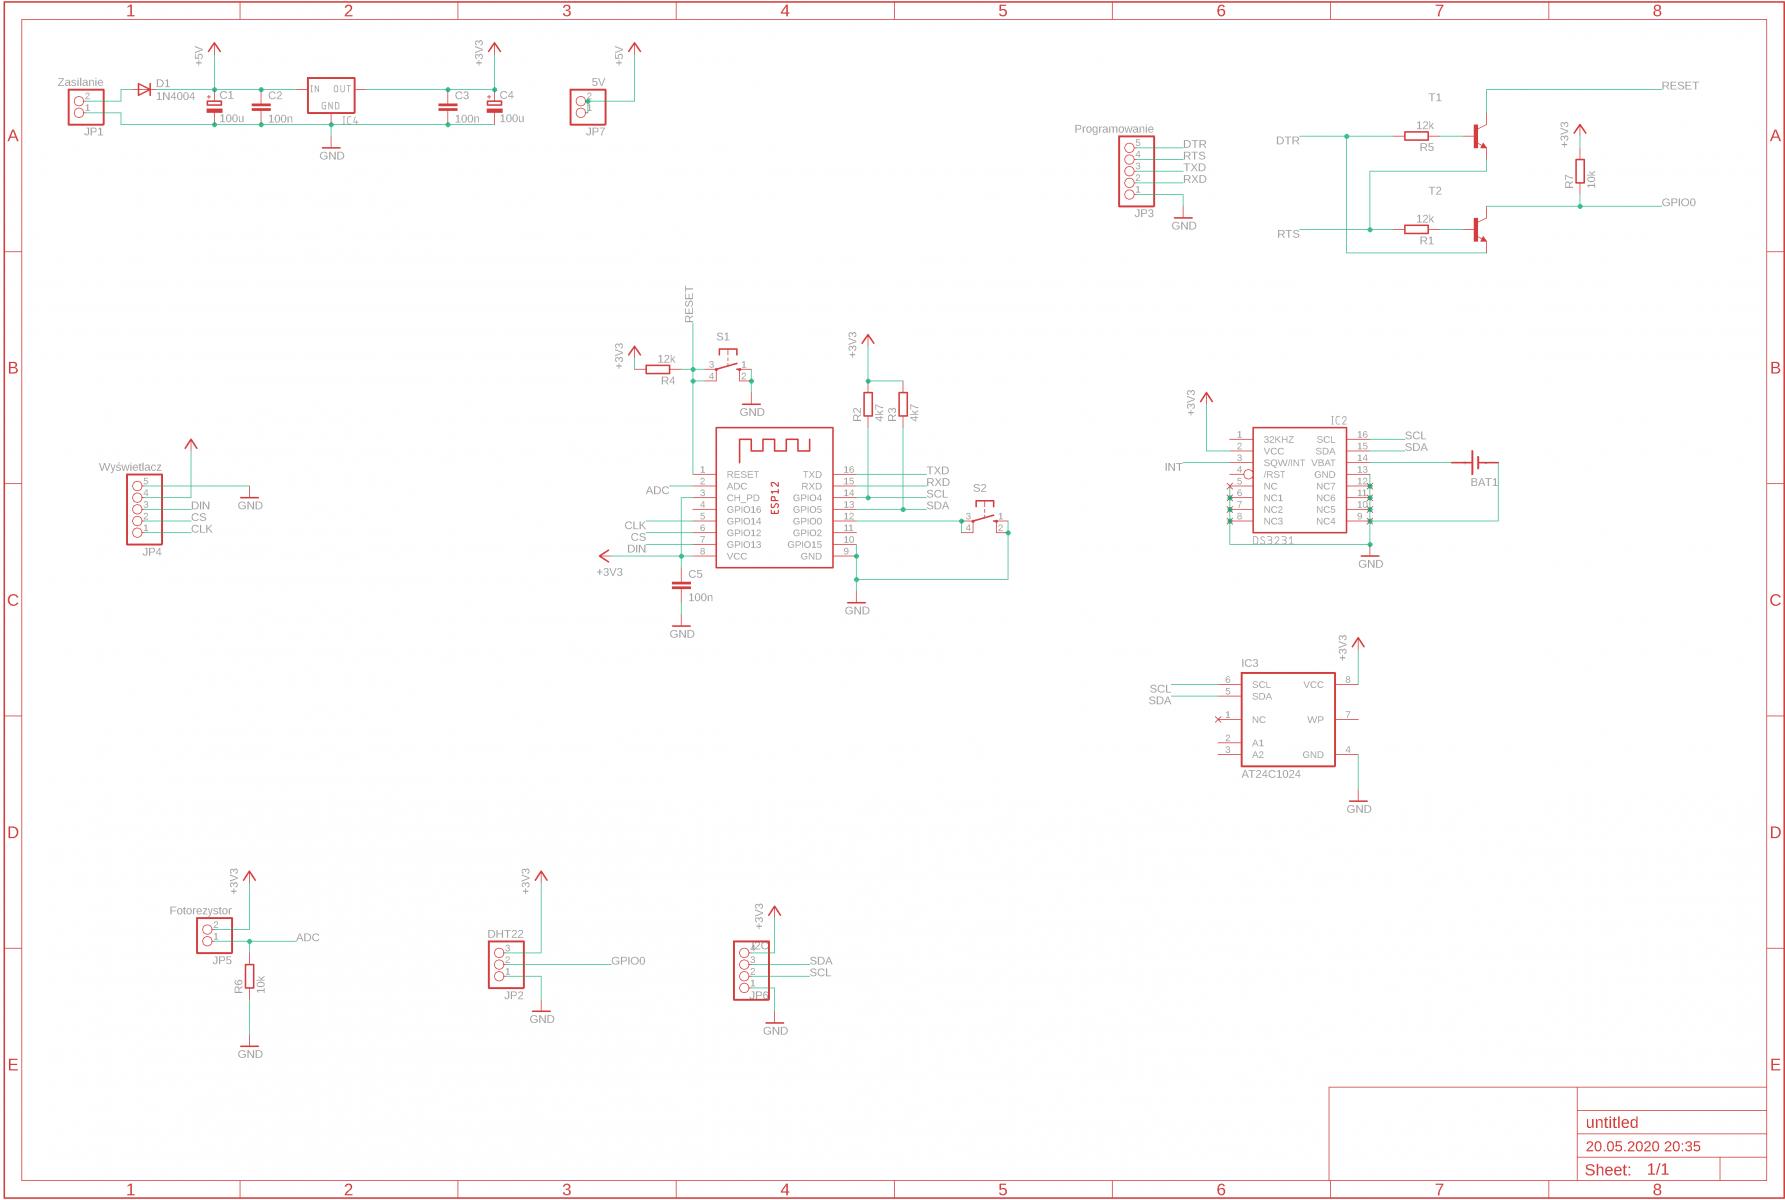 Zegar LED - Schemat